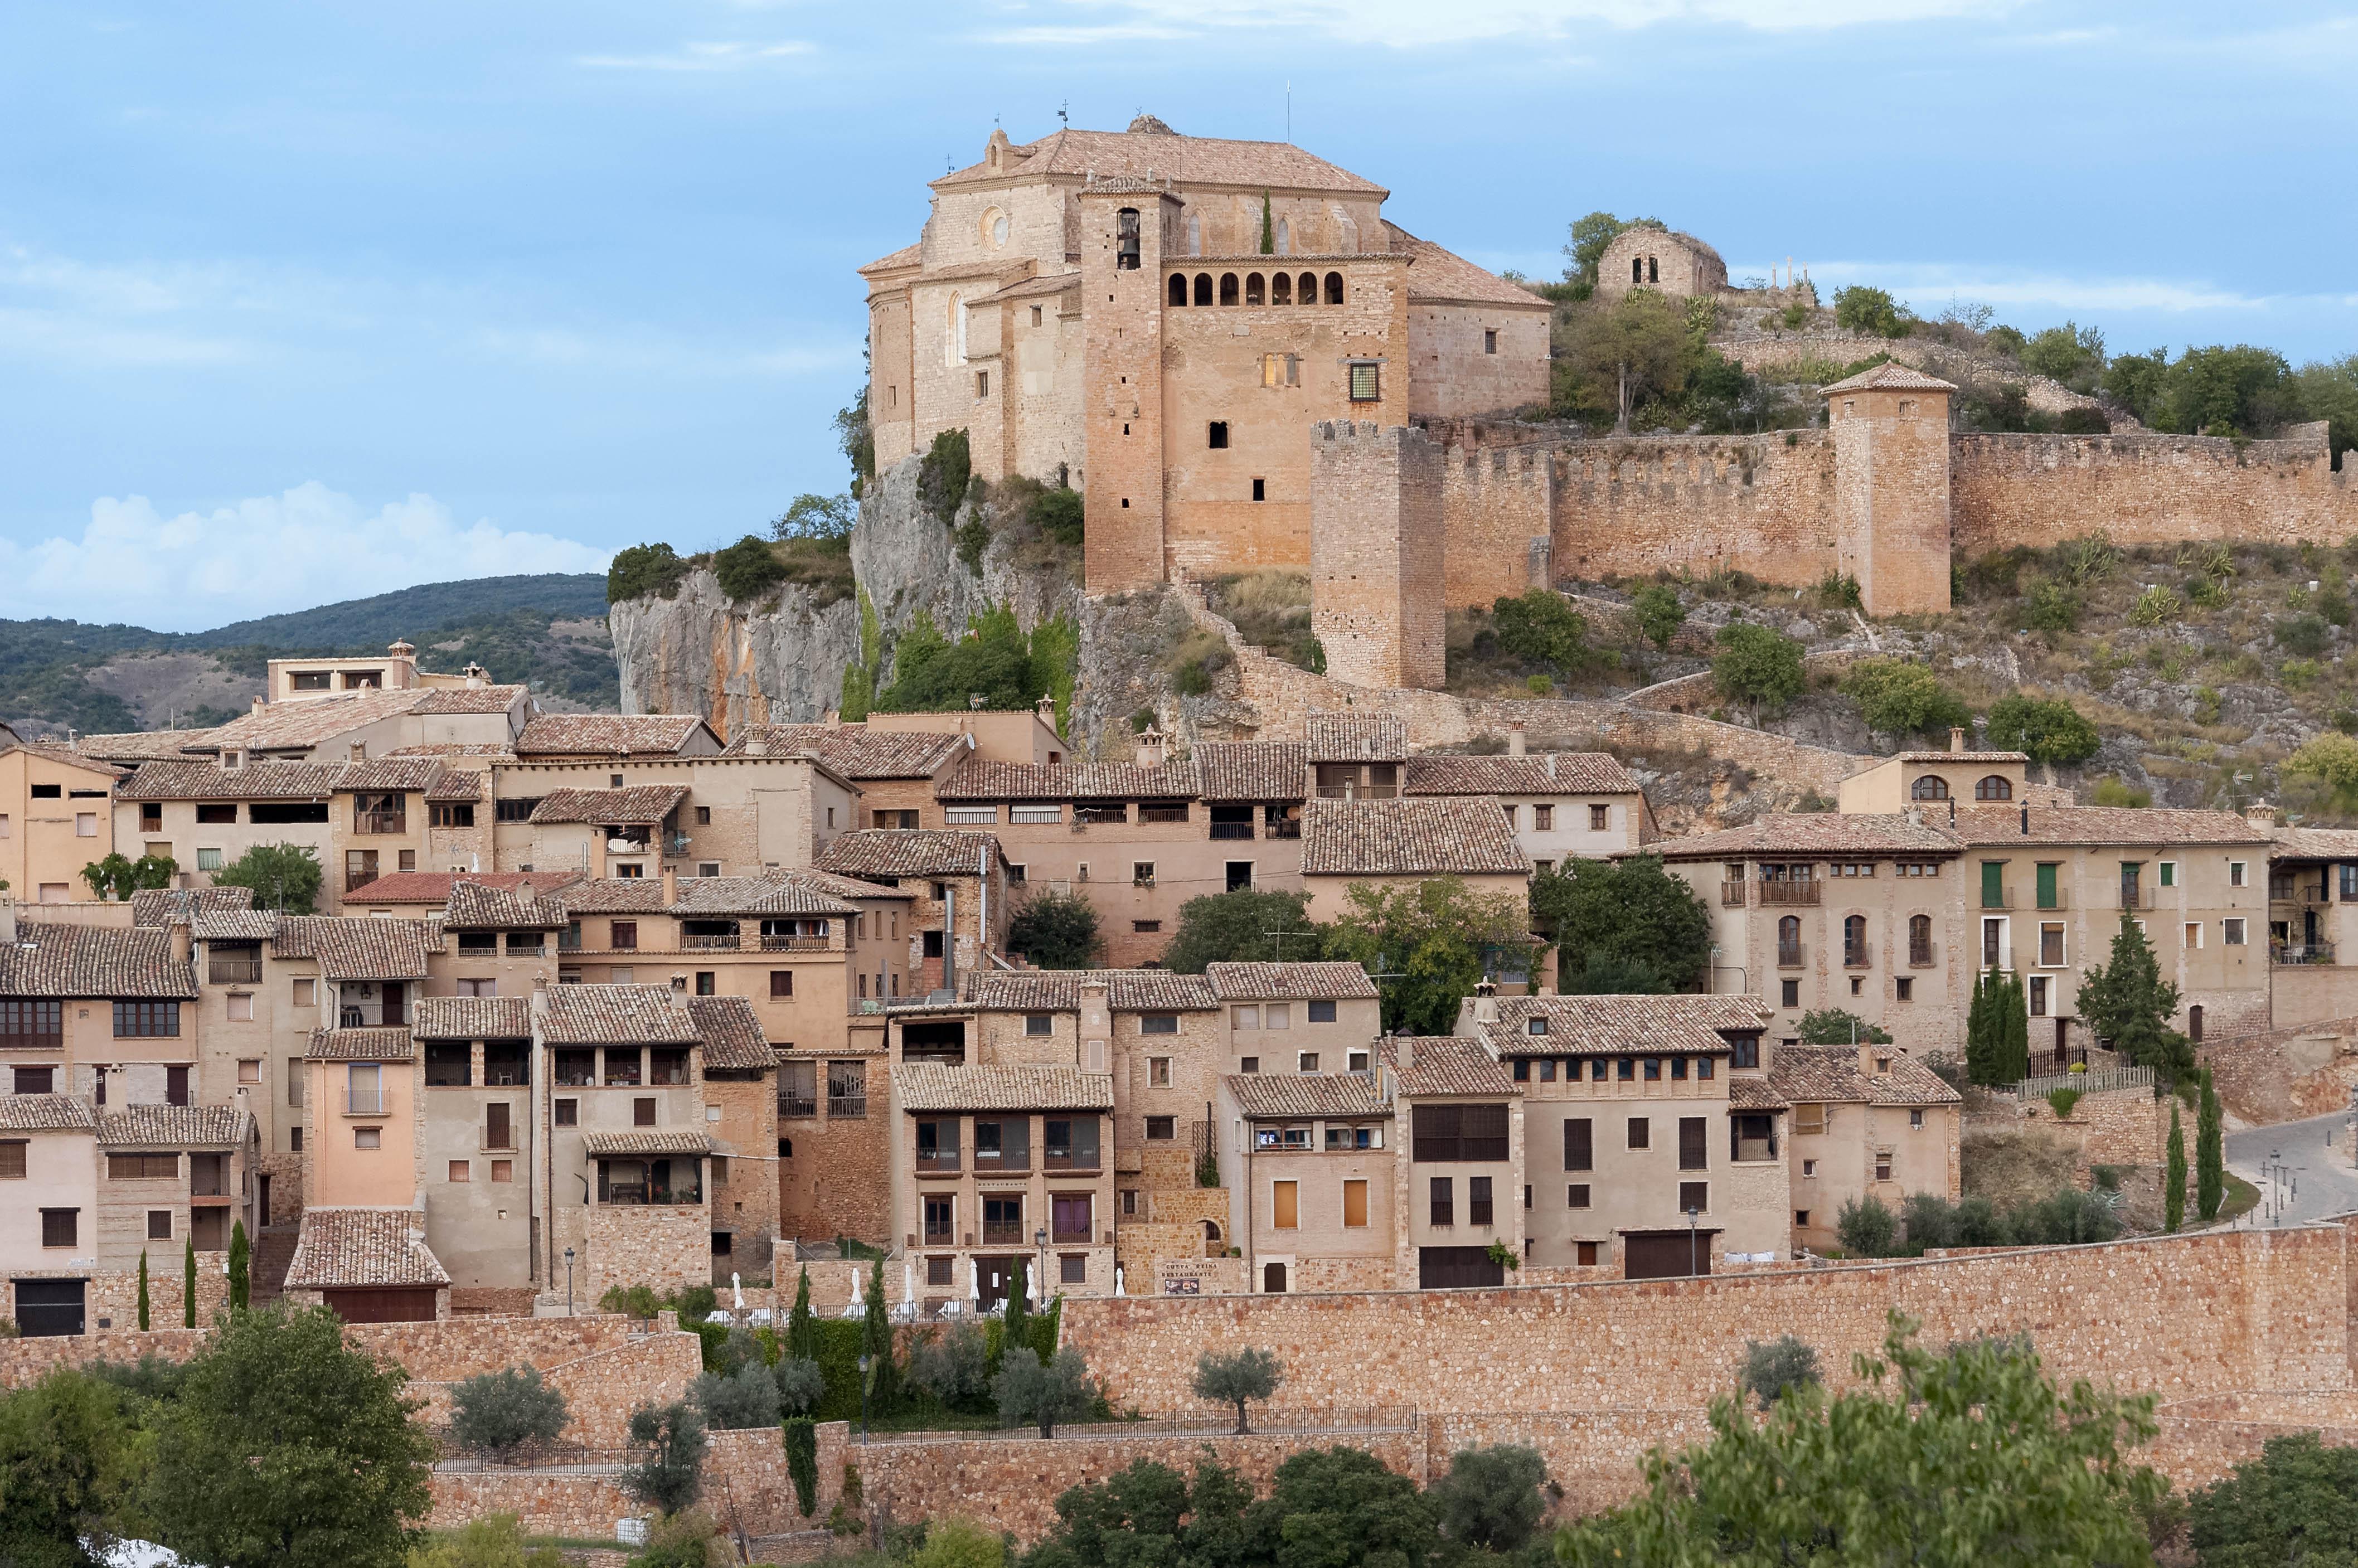 4262_Alquezar (Aragon)